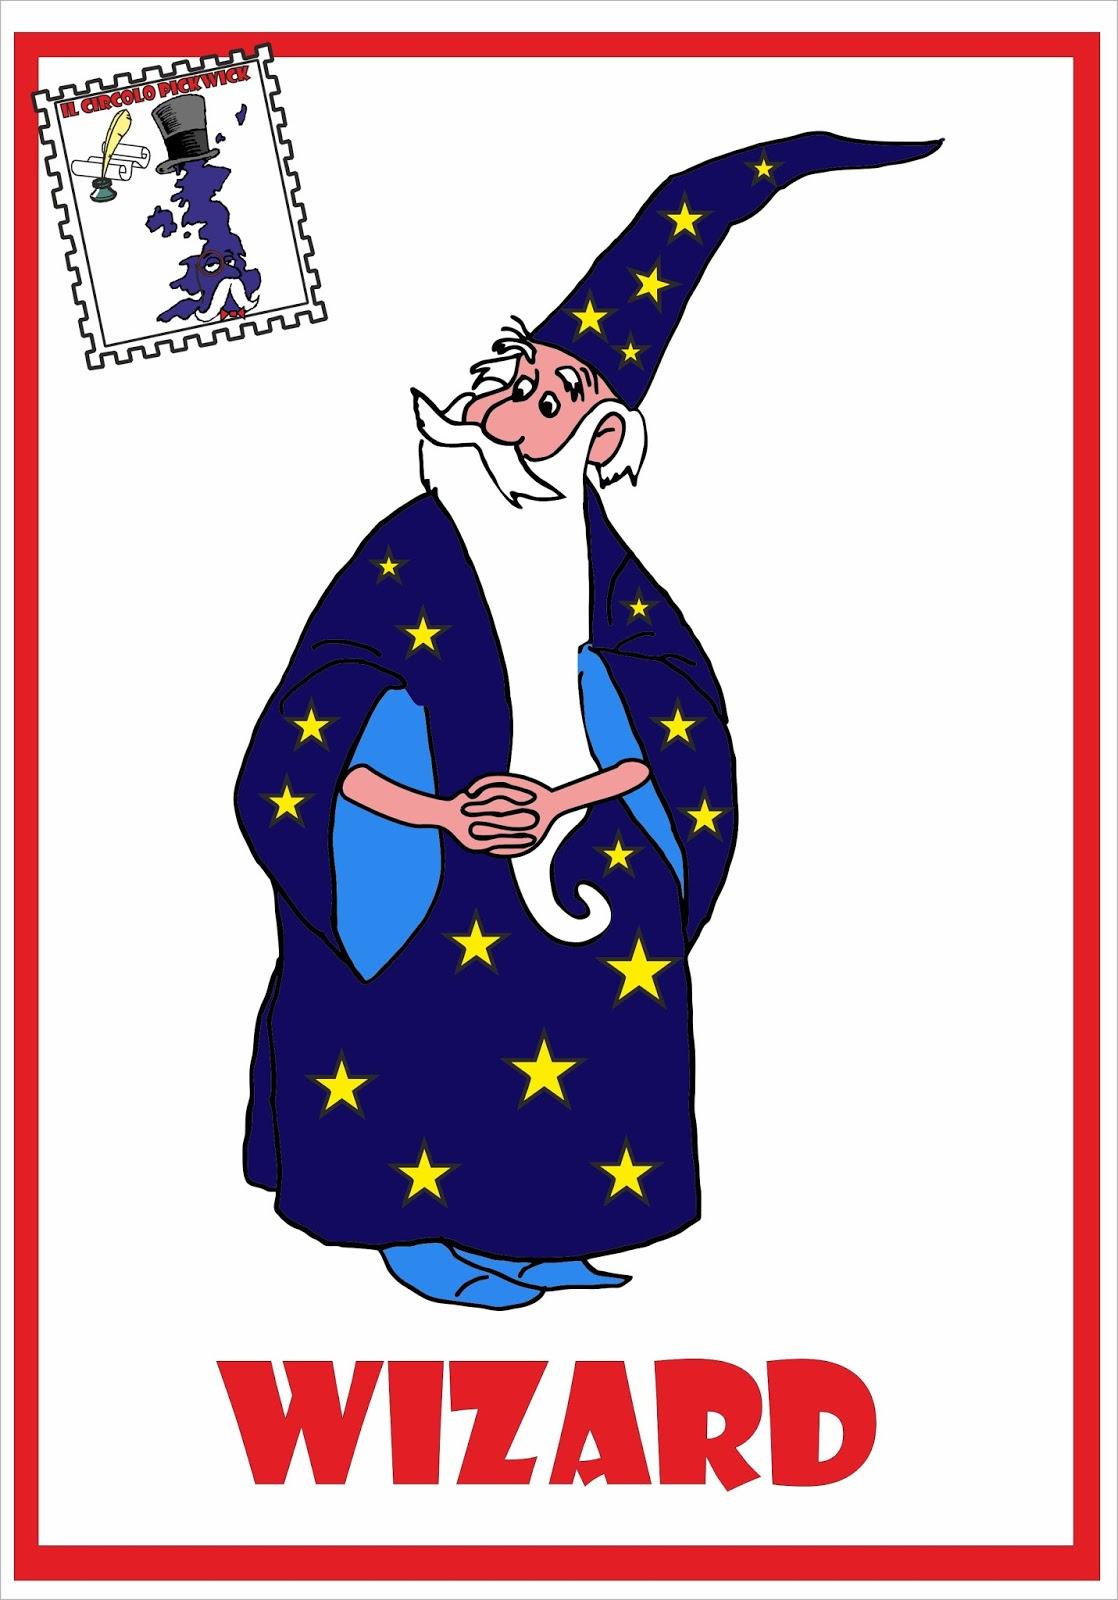 Wizard in inglese